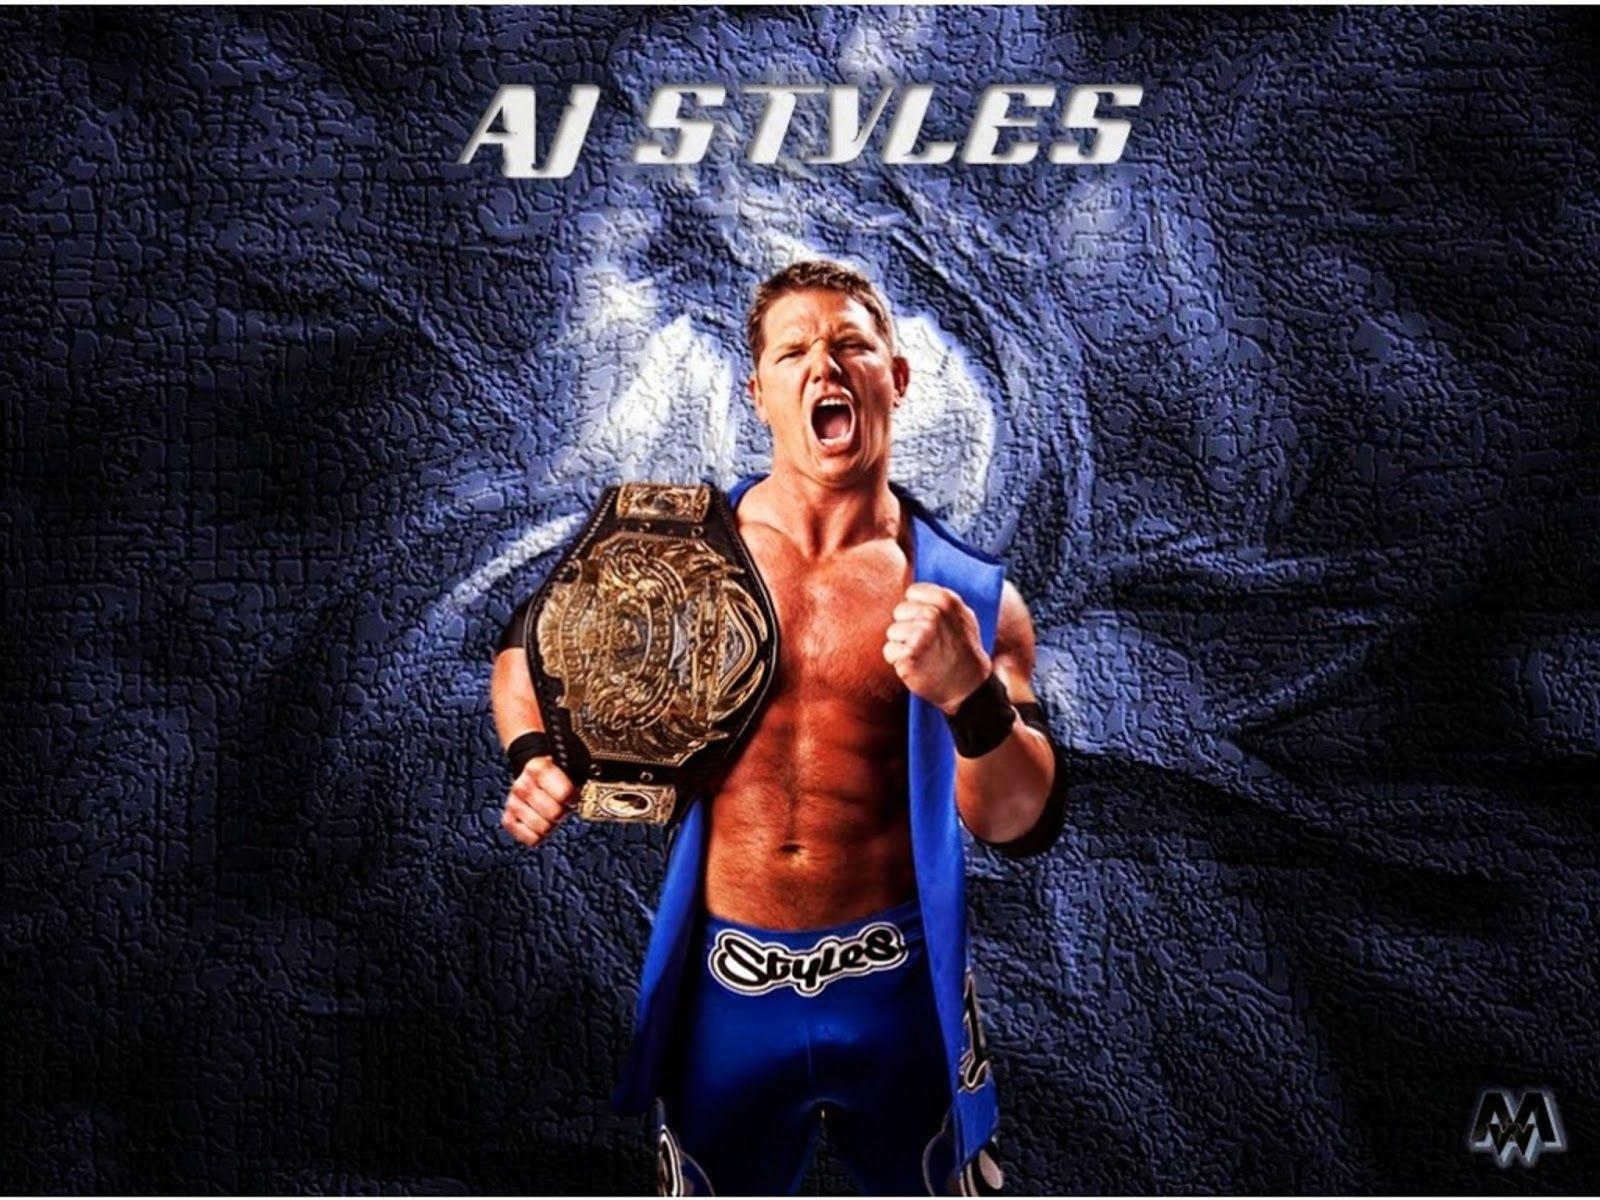 AJ Styles Hd Free Wallpapers | WWE HD WALLPAPER FREE DOWNLOAD